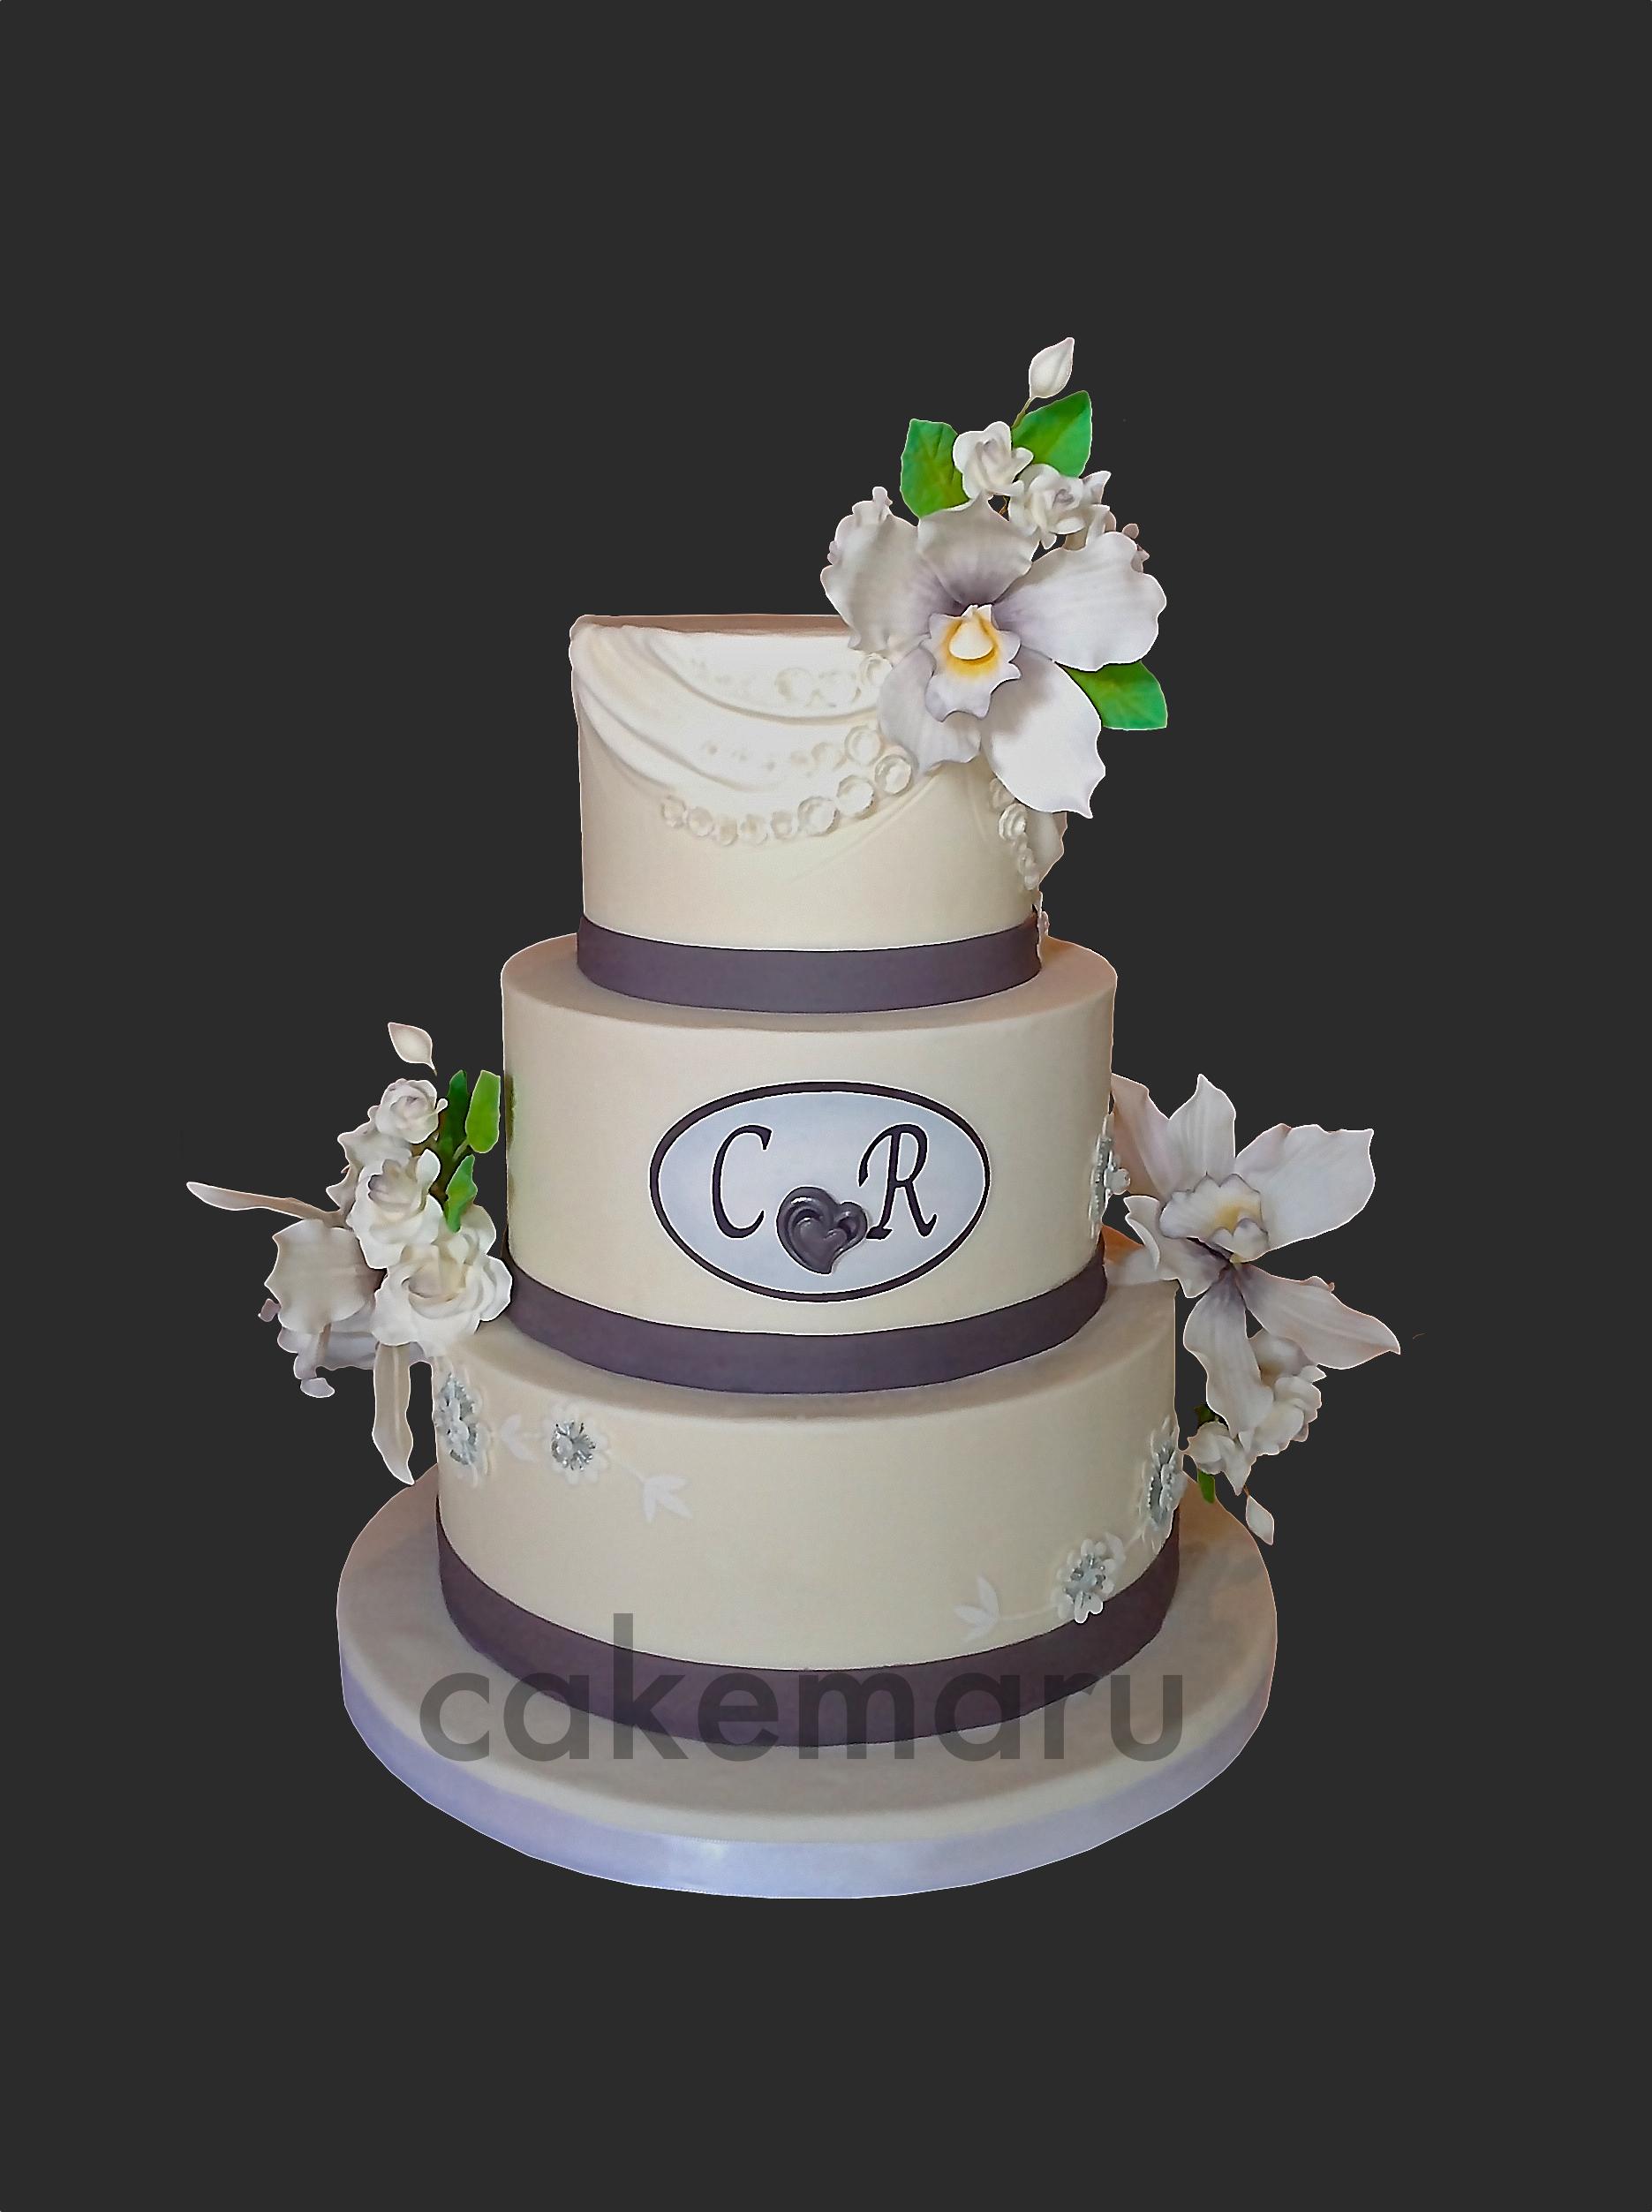 C&R Wedding Cake 1 with name.jpg